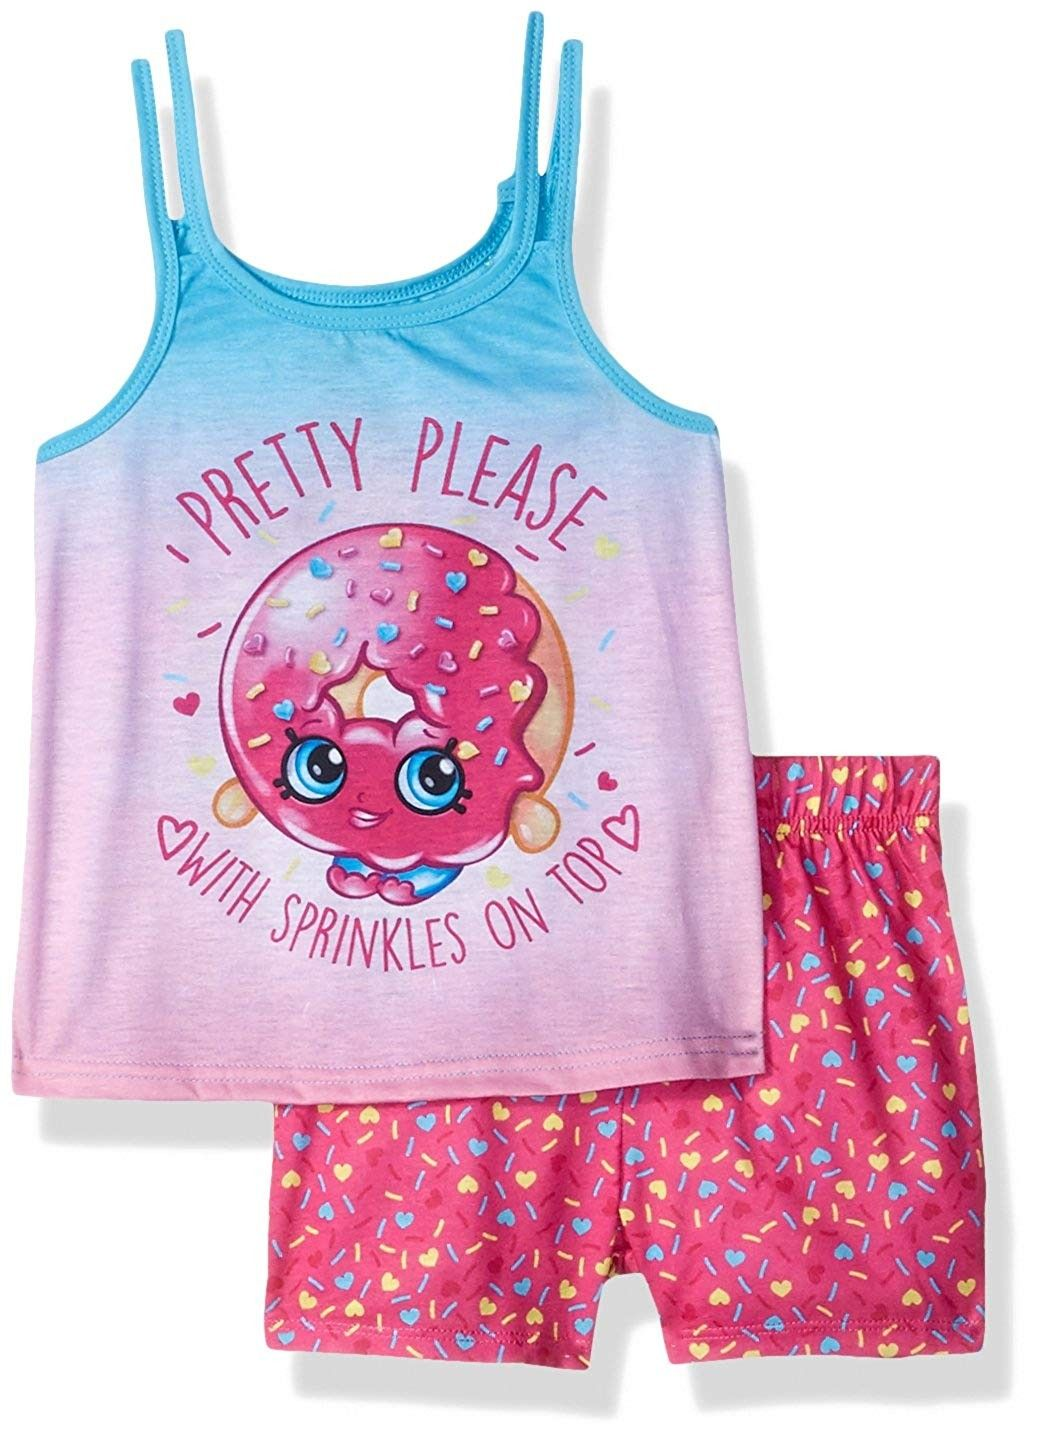 Girls' Shopkins Pretty Please Pajama Tank Top Set Pink